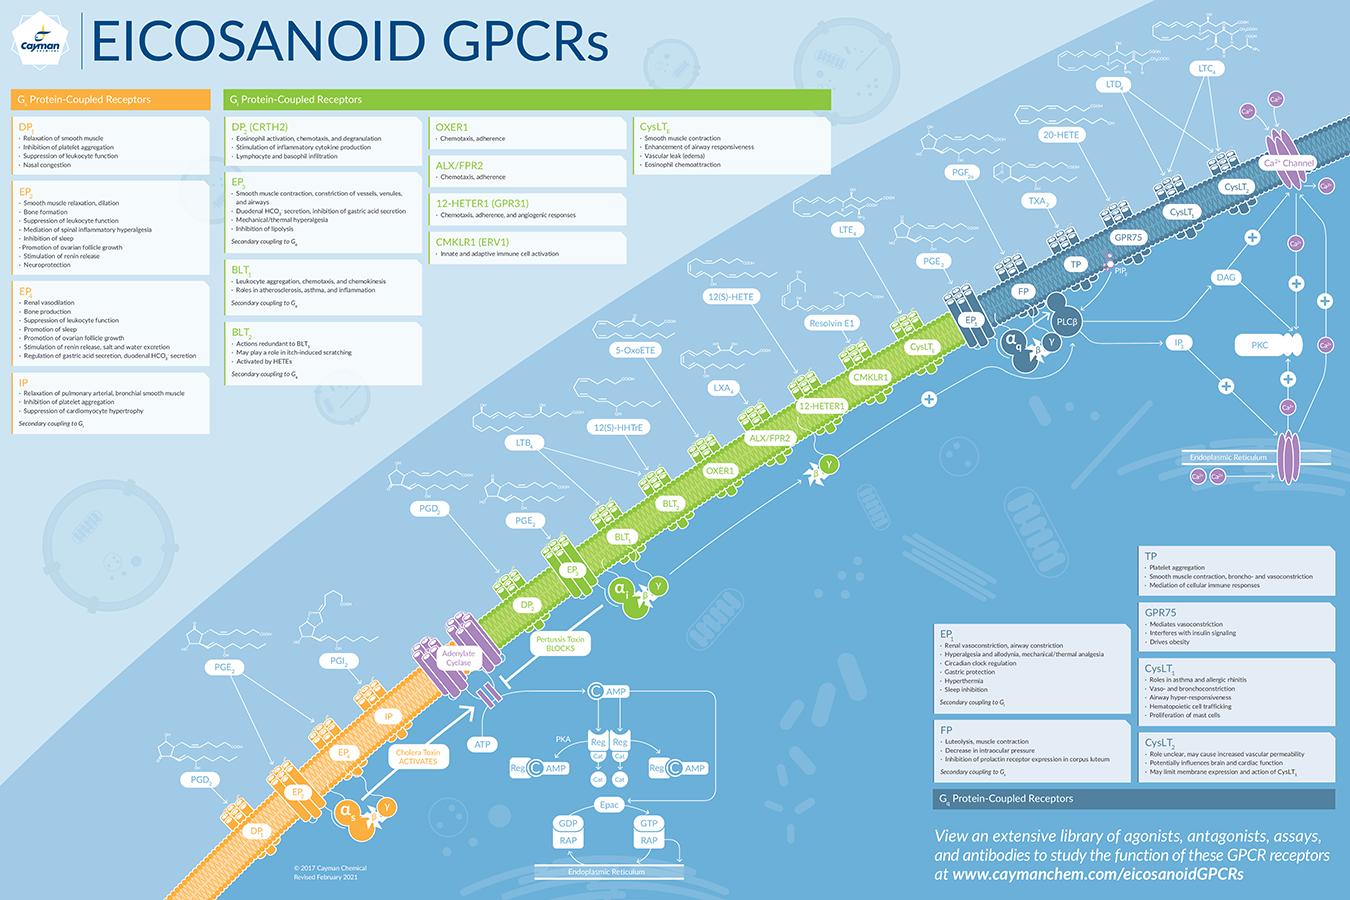 Eicosanoid GPCRs